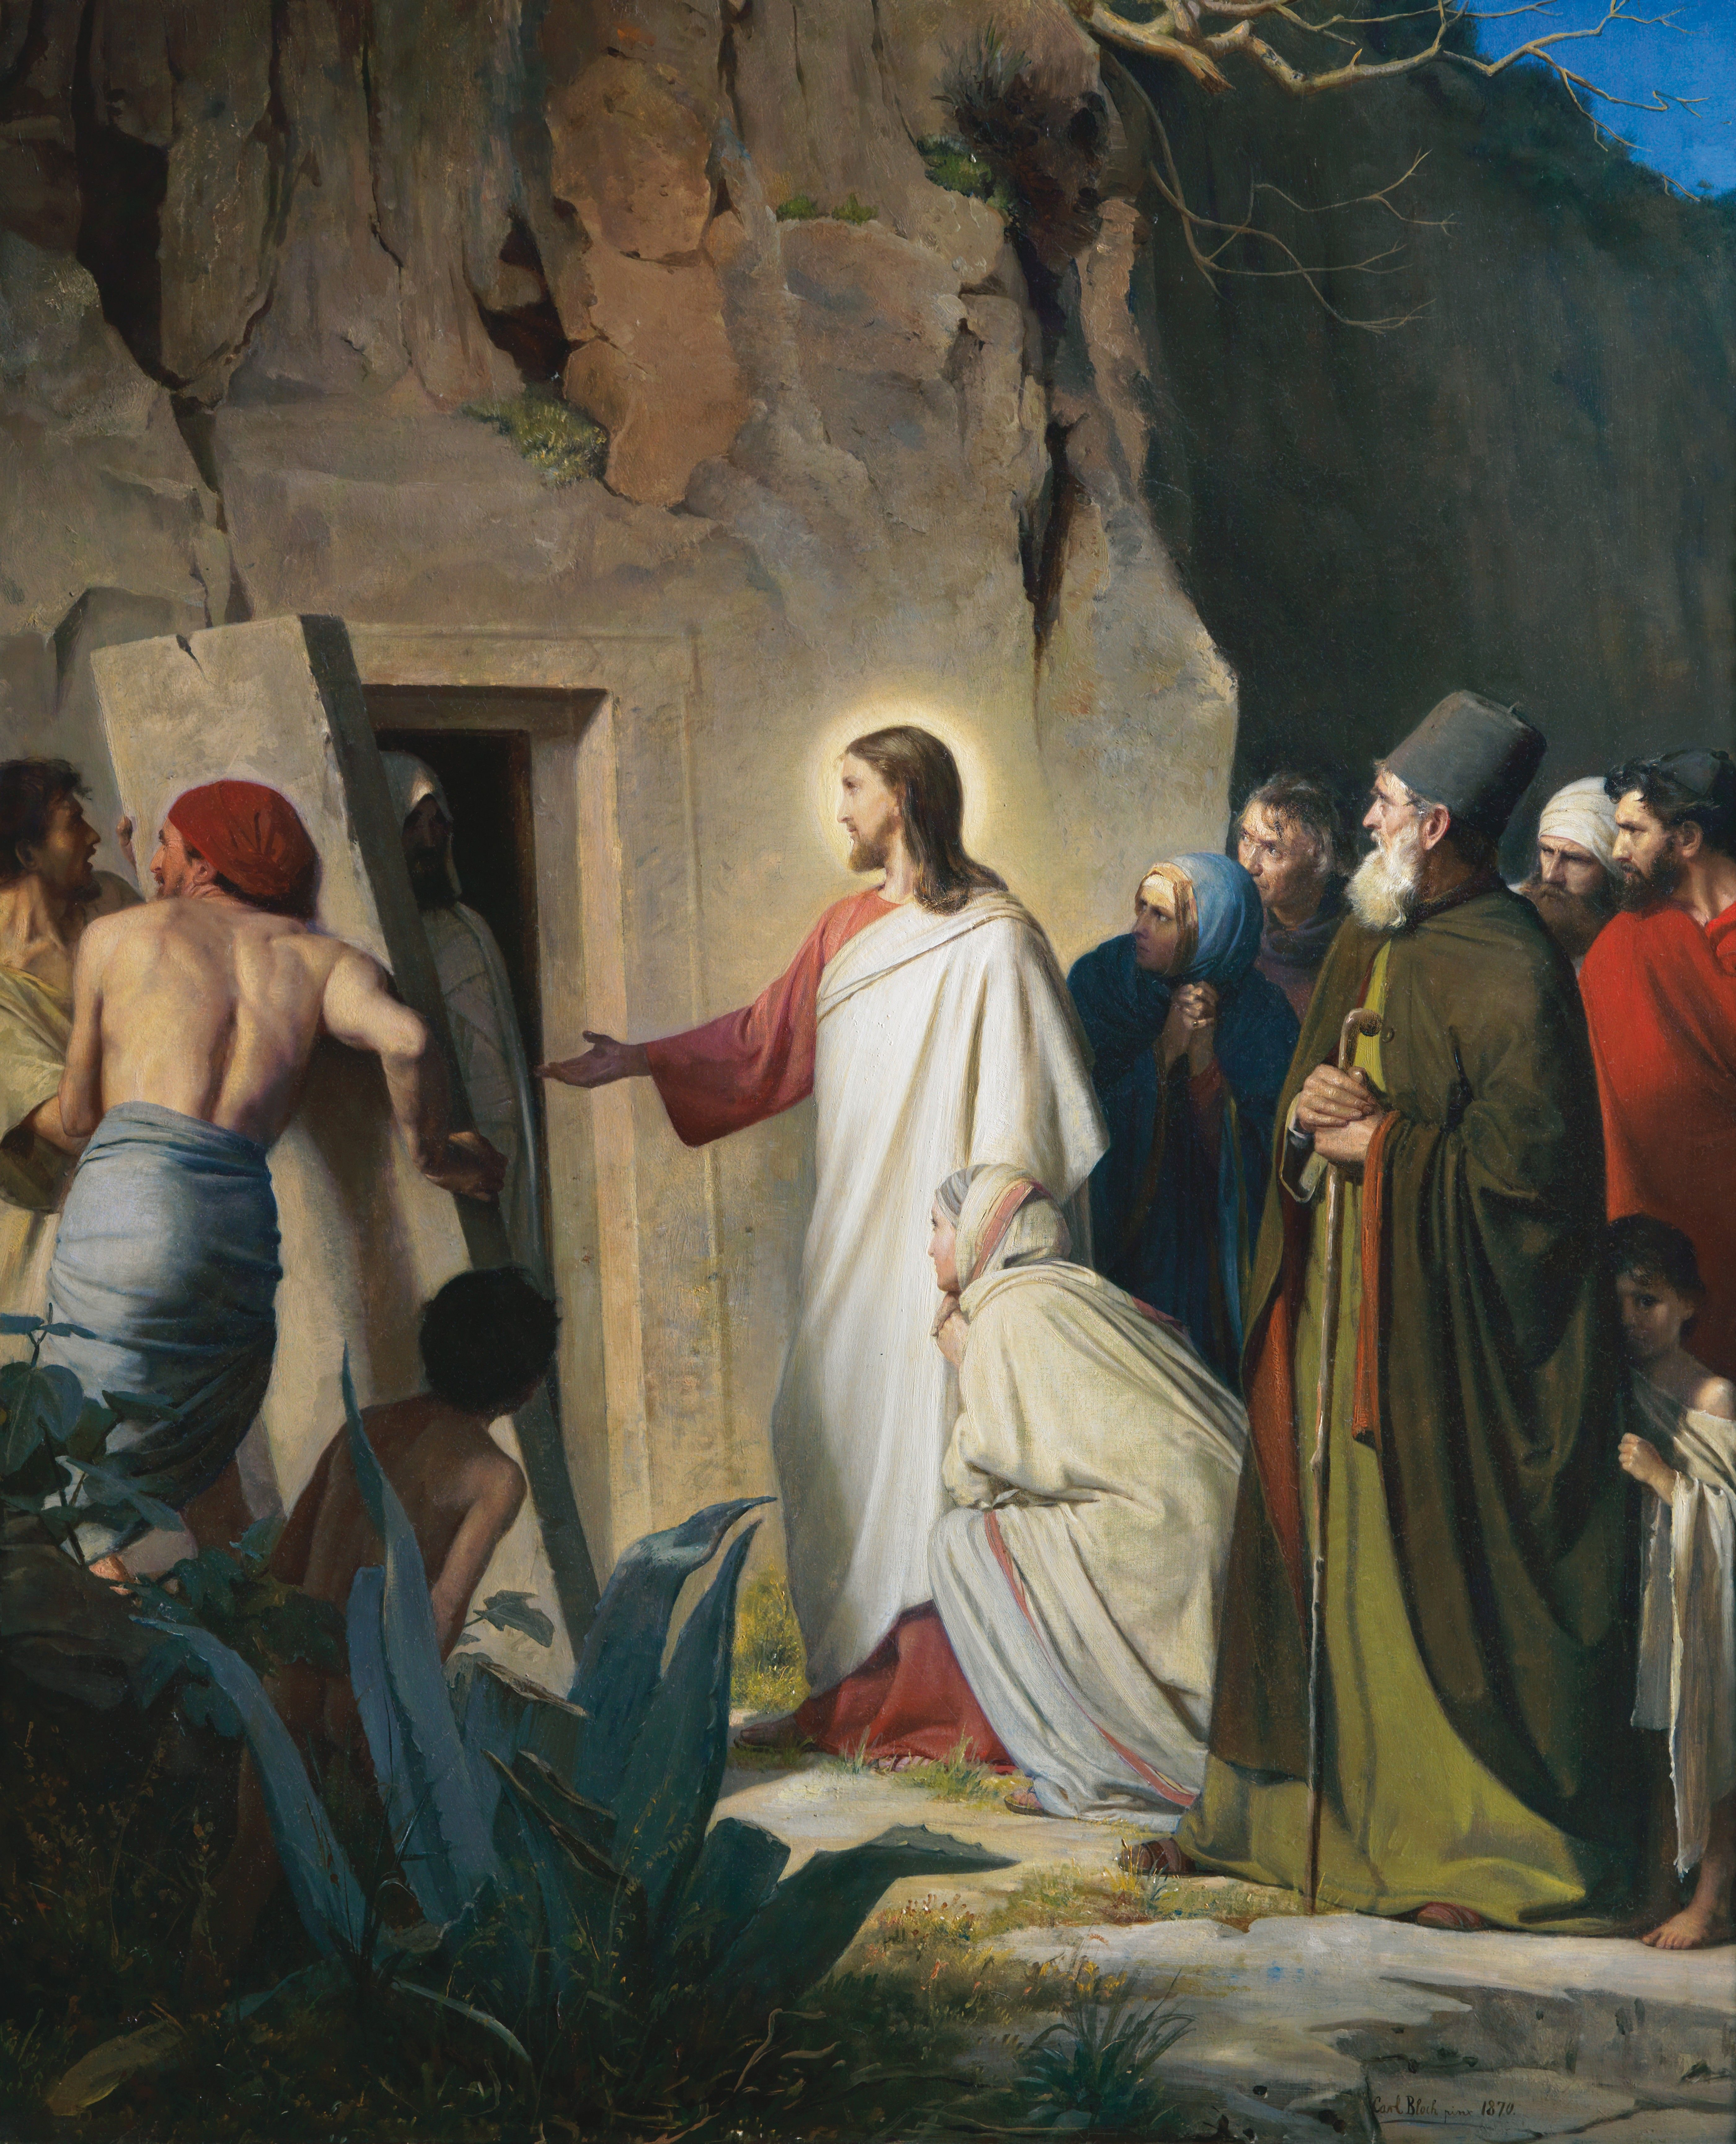 Jesus Raising Lazarus from the Dead (Lazarus), by Carl Heinrich Bloch (62148); GAK 222; GAB 49; Primary manual 7-27; John 11:1–46